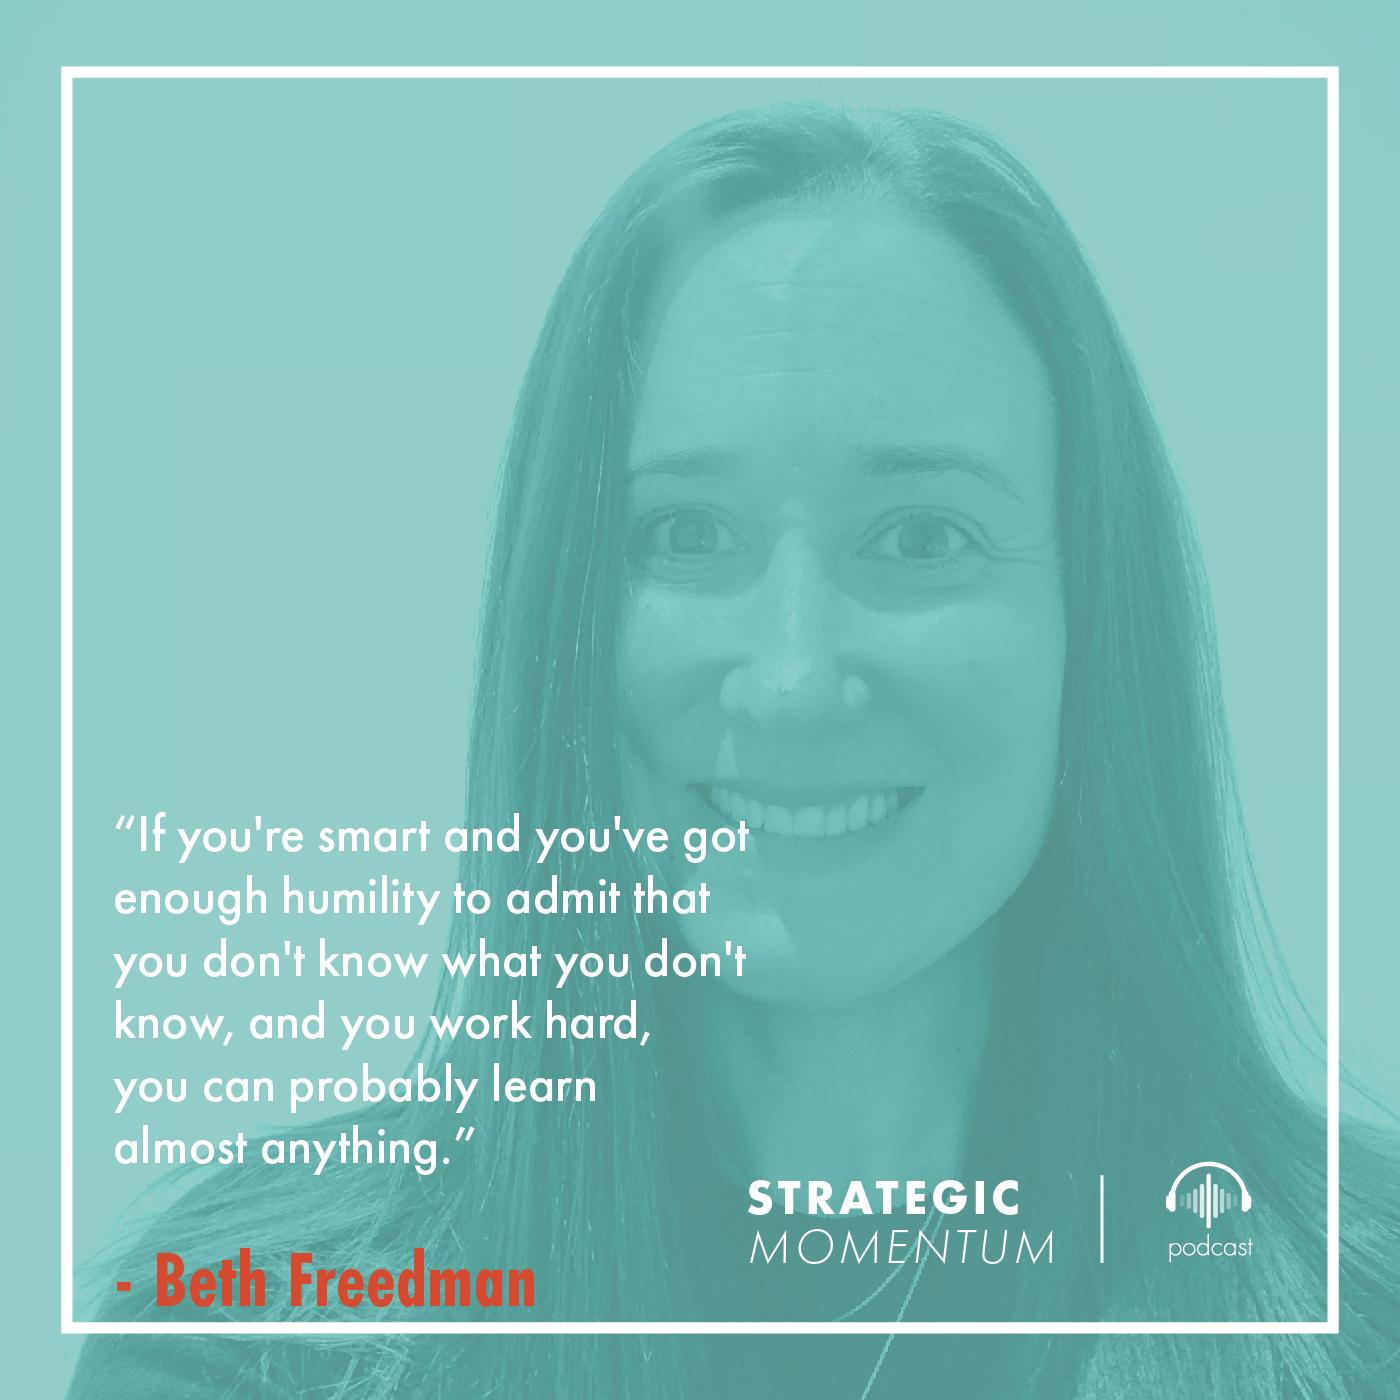 Beth Freedman Quote | Strategic Momentum Podcast